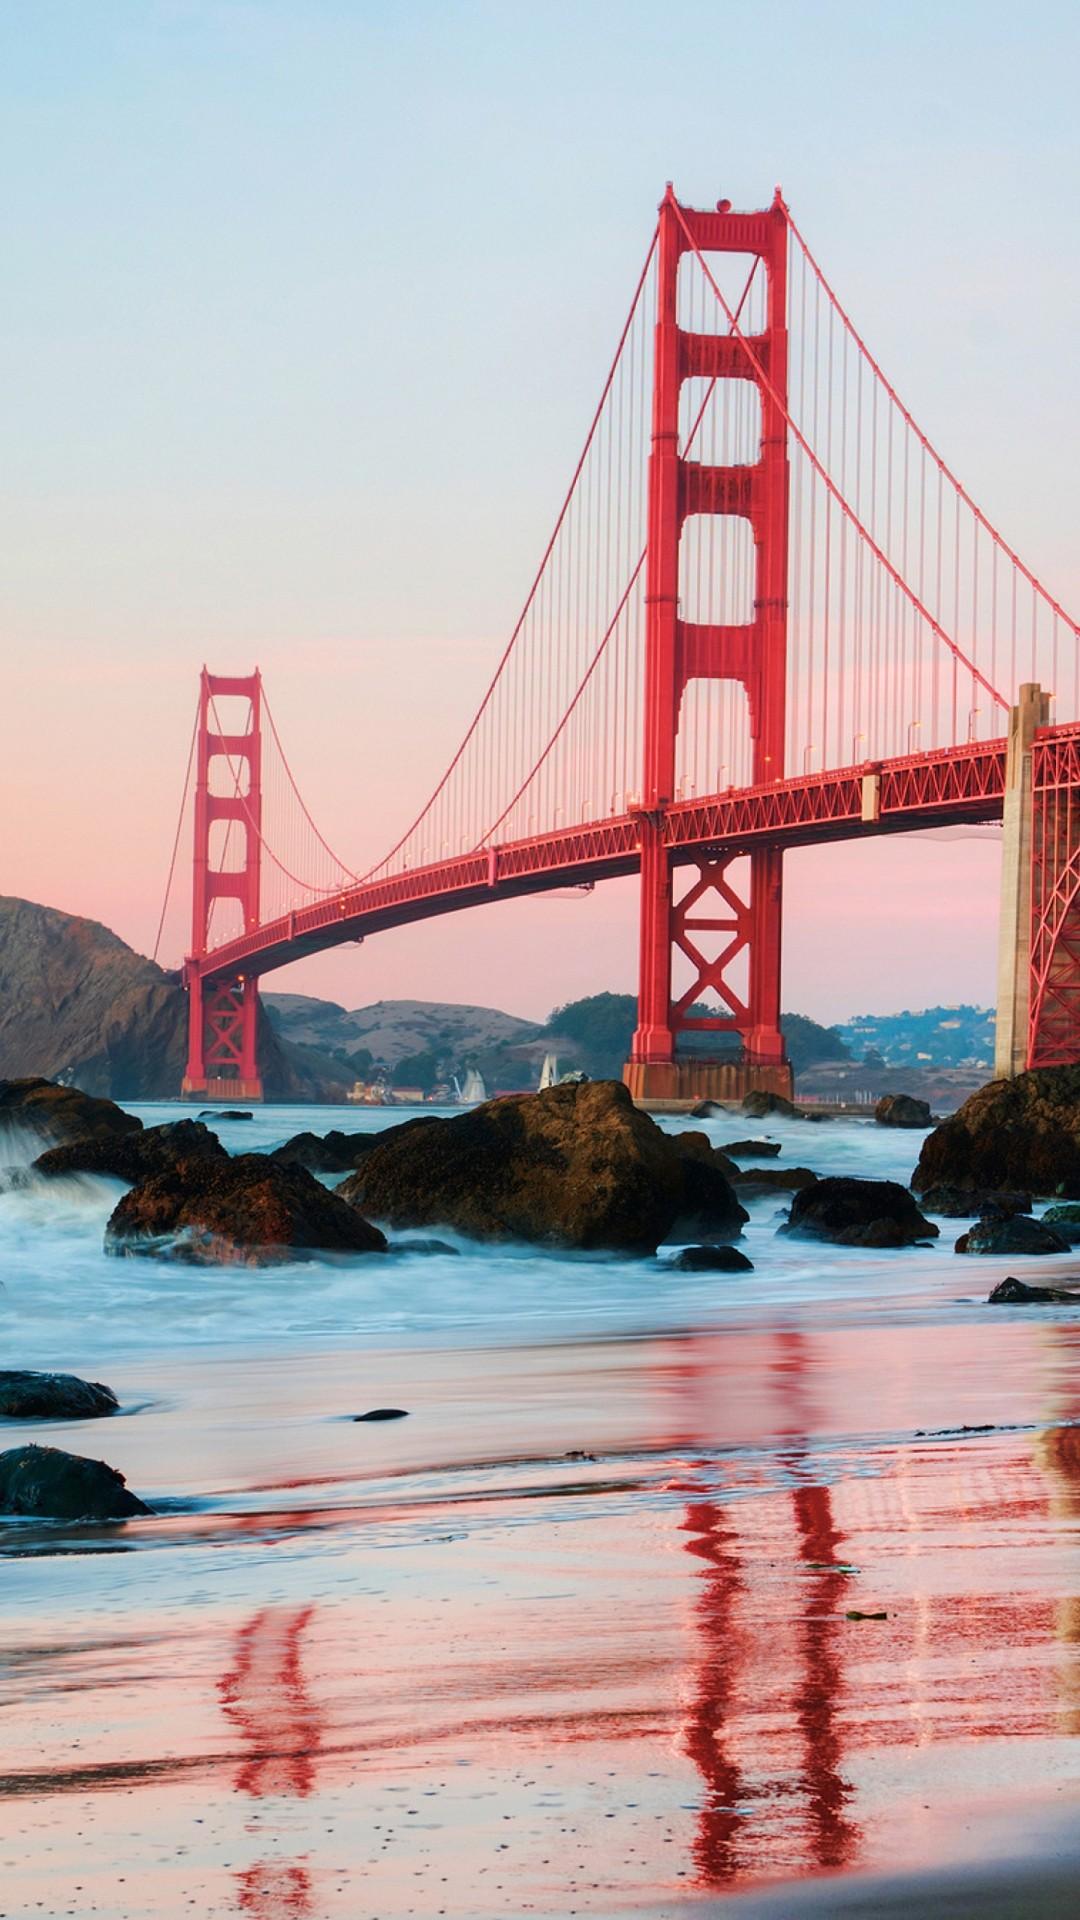 Golden Gate Bridge iphone wallpaper